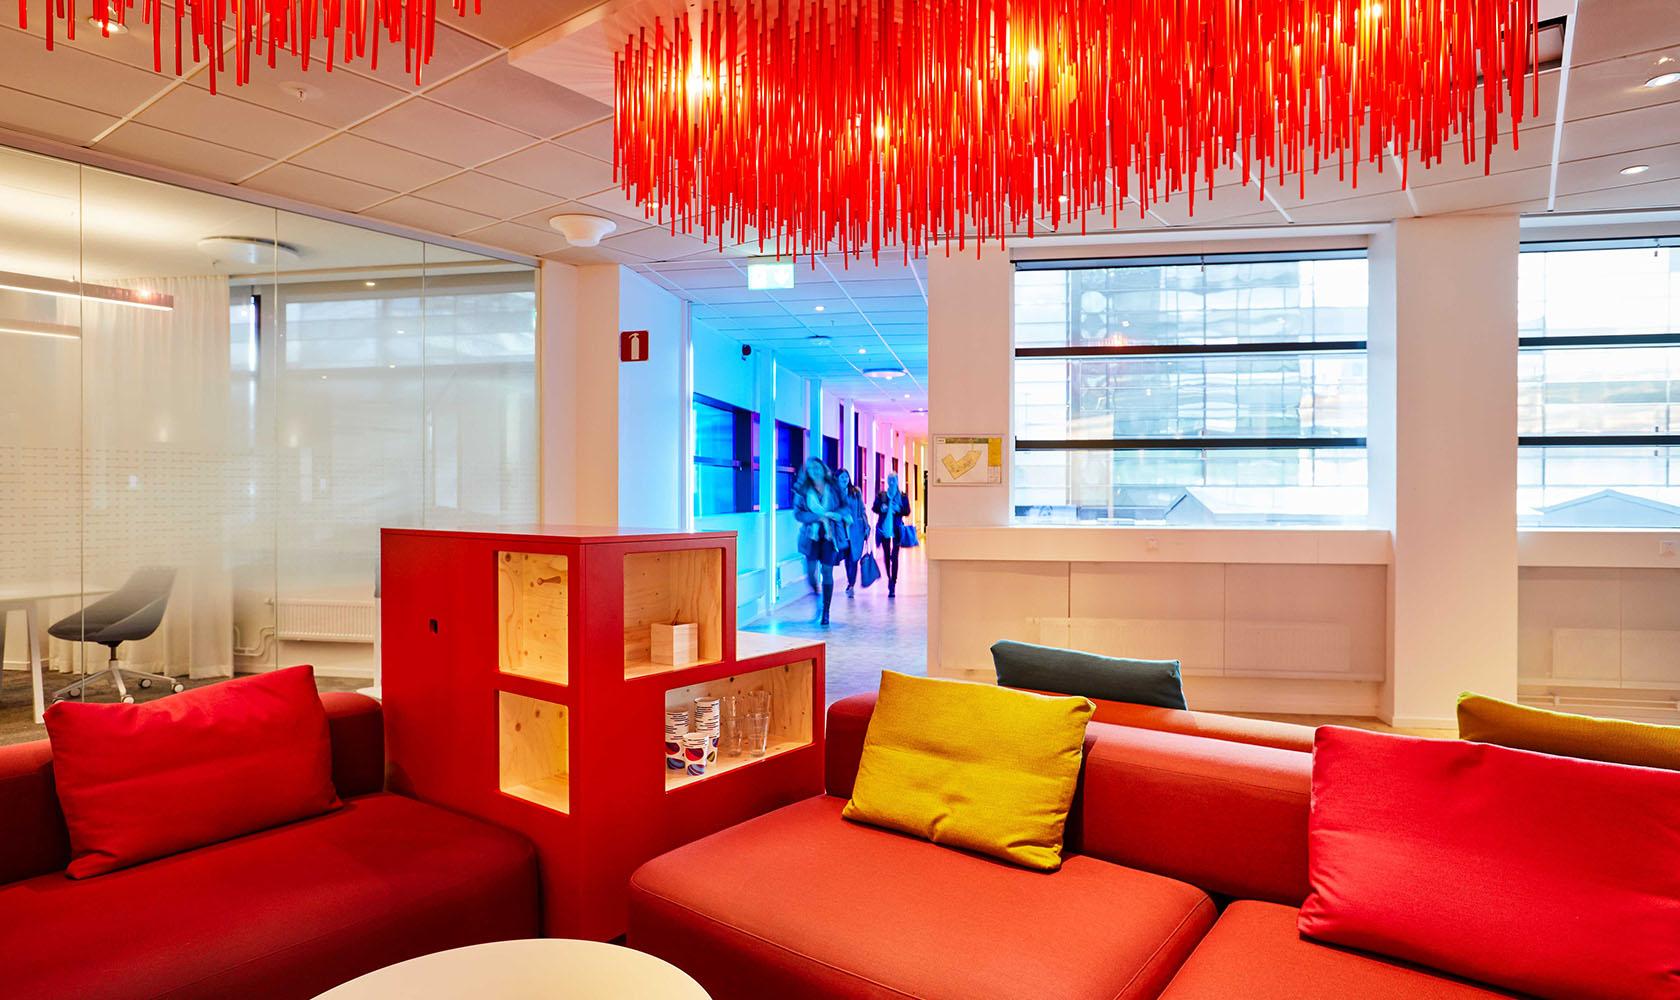 Kontor med röd belysning